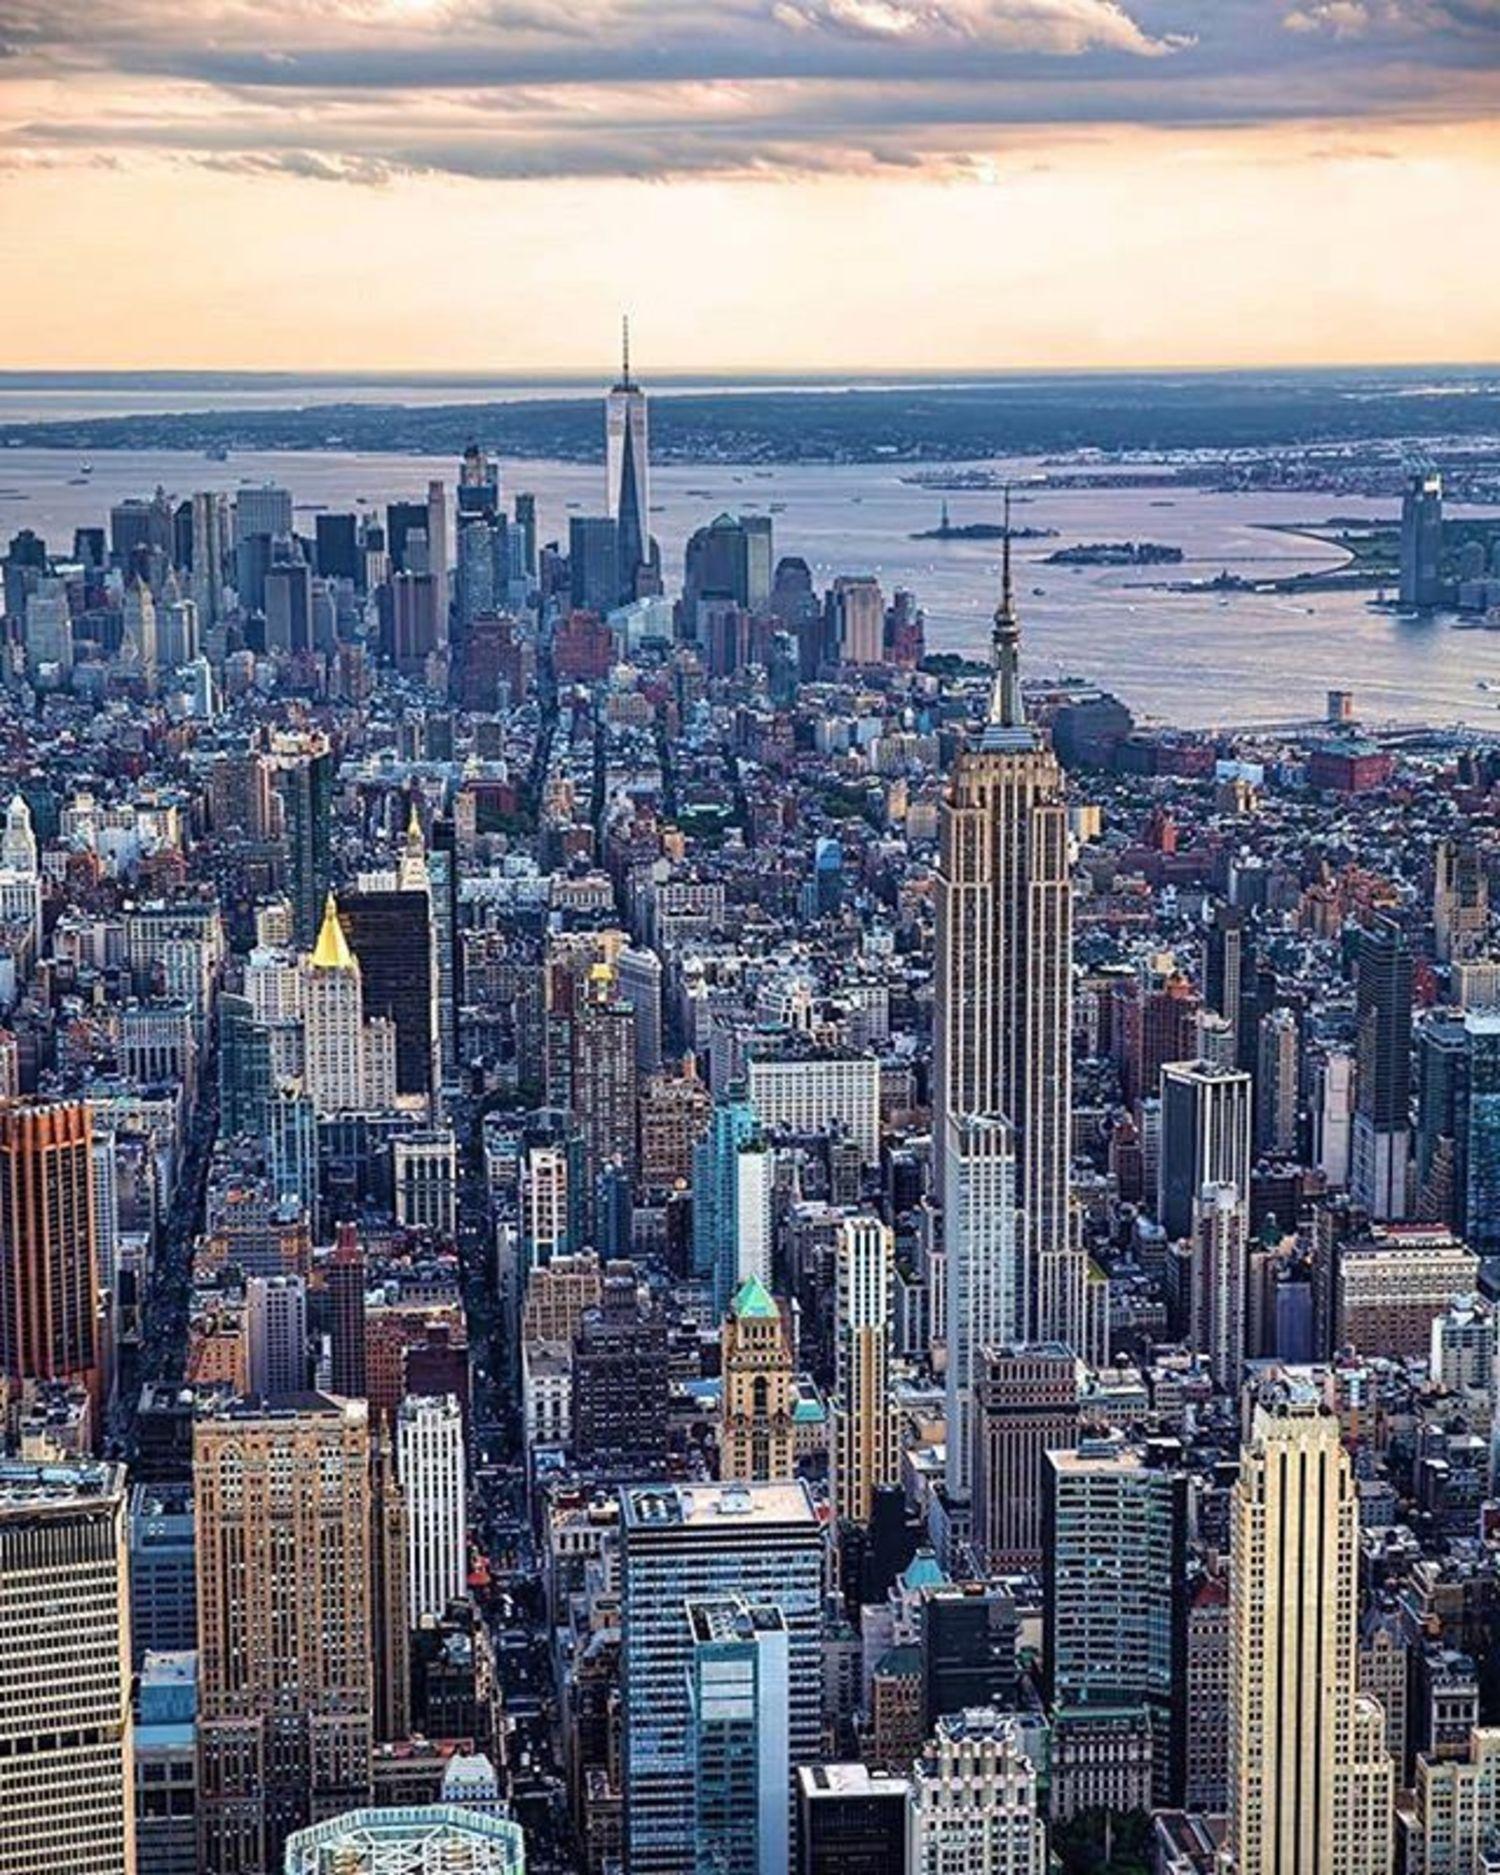 New York, New York. Photo via @mattpugs #viewingnyc #newyorkcity #newyork #nyc